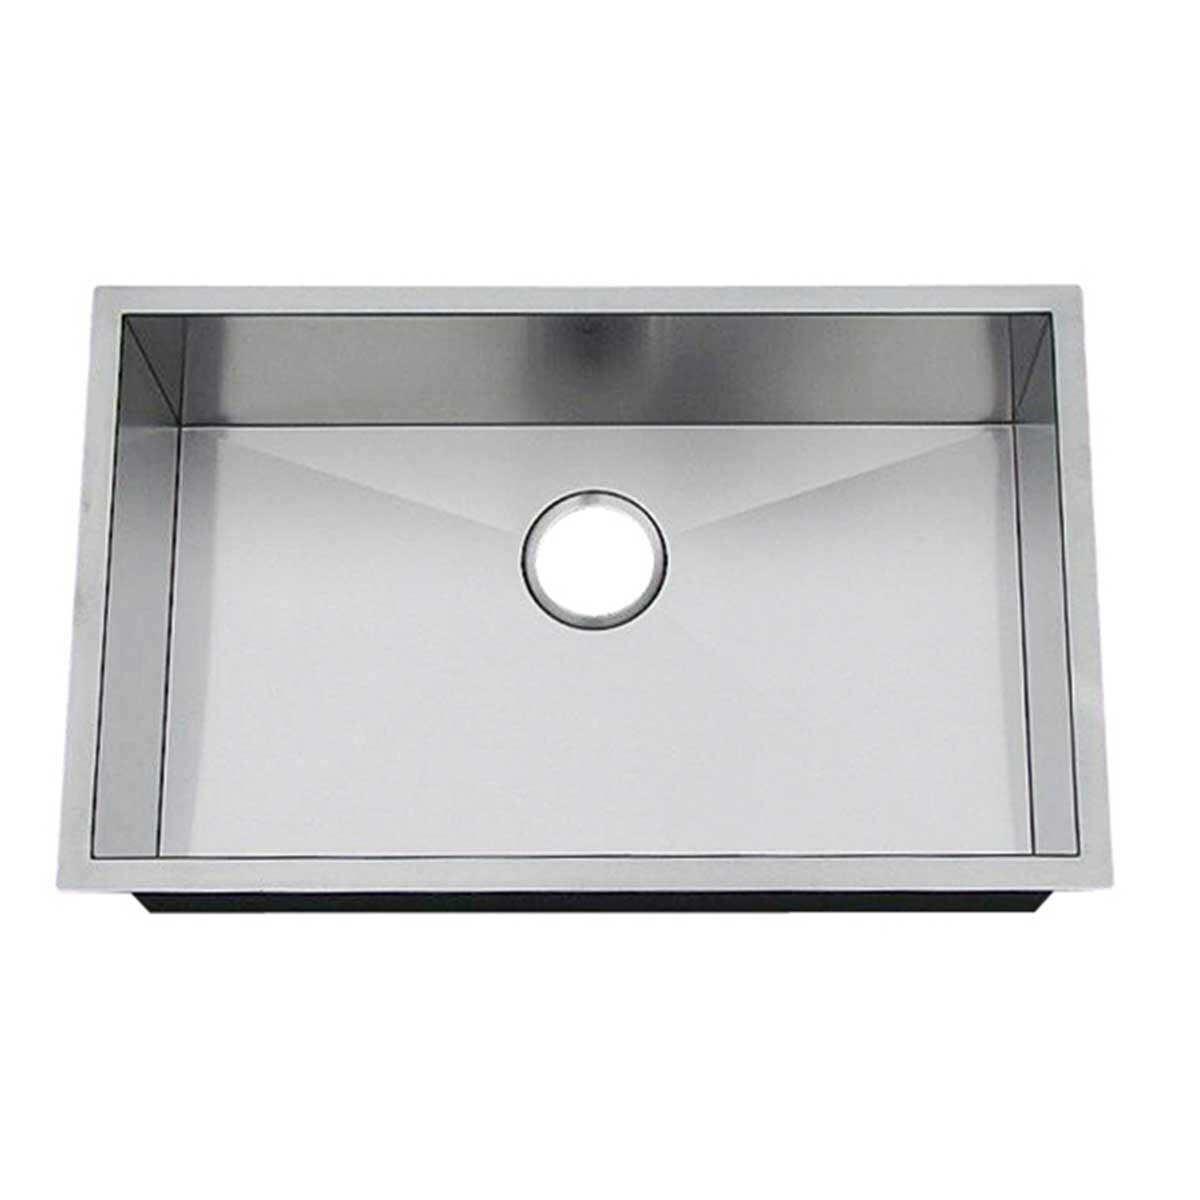 Artisan CPUZ2919-D10 Chef Pro Single Bowl Undermount Sink